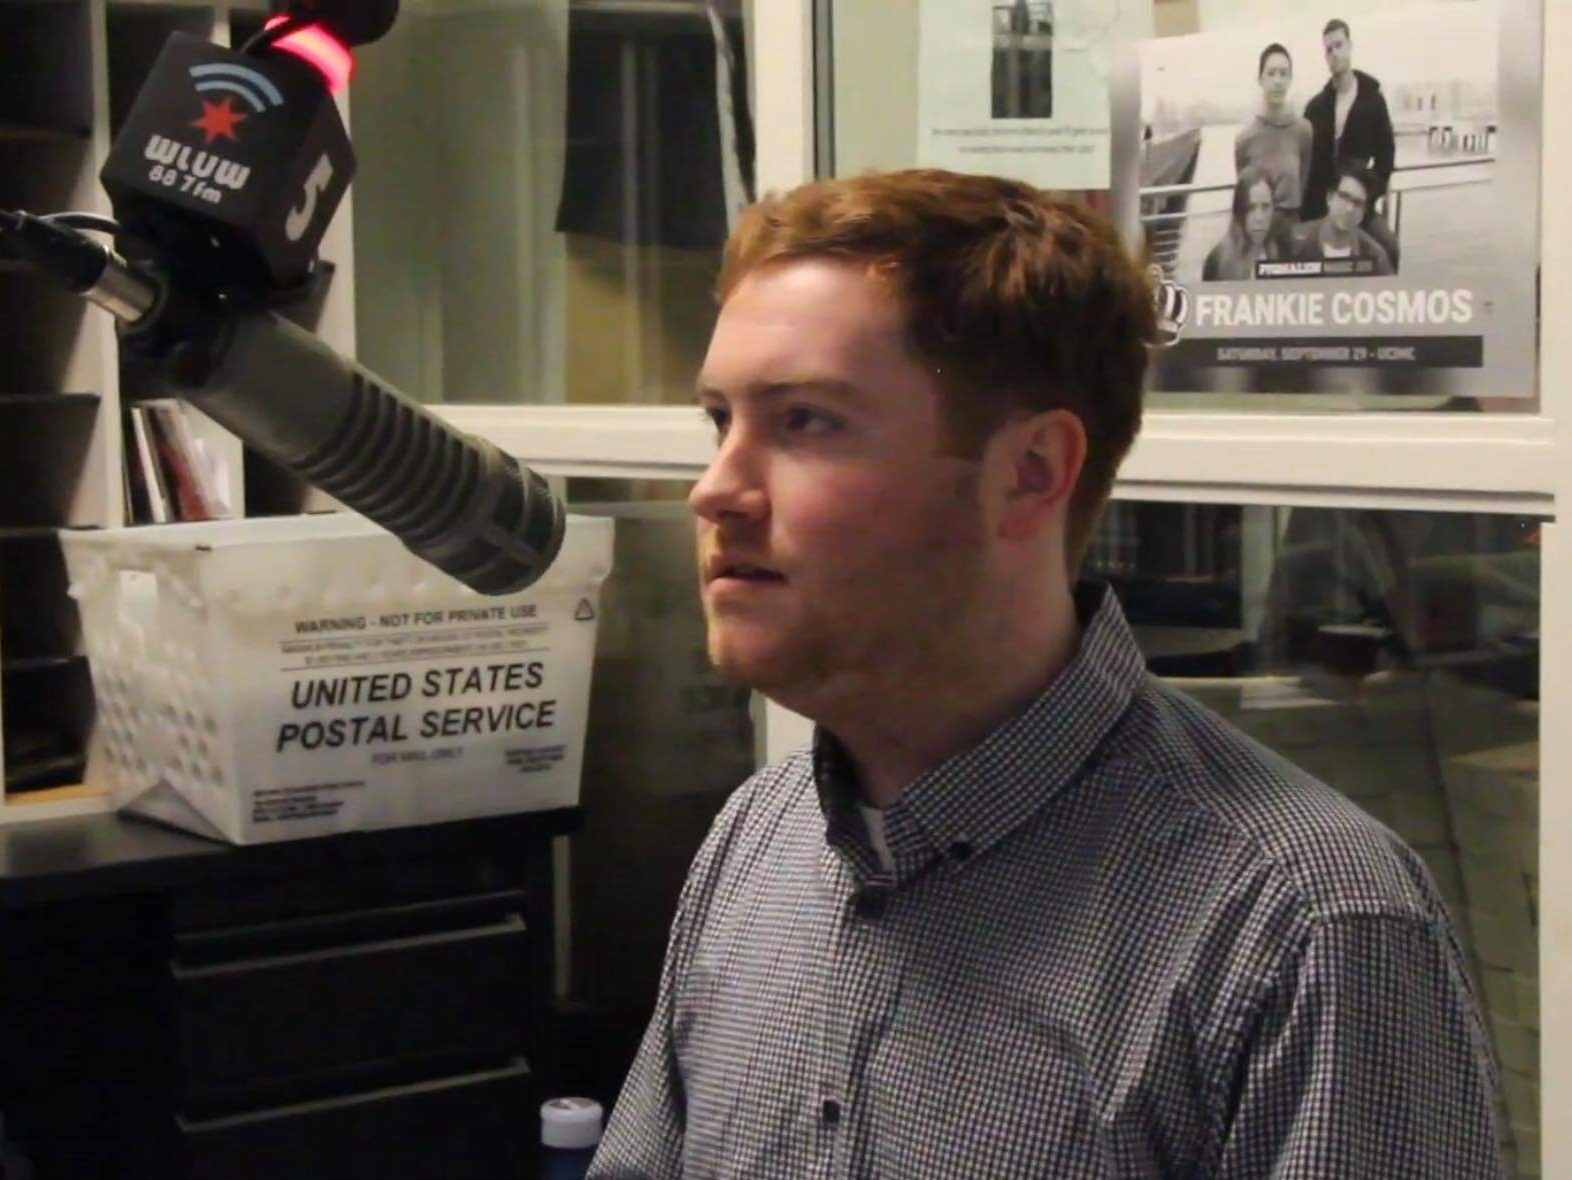 Michael McDevitt - Managing editor of Loyola University Chicago's student newspaper, Loyola Phoenix